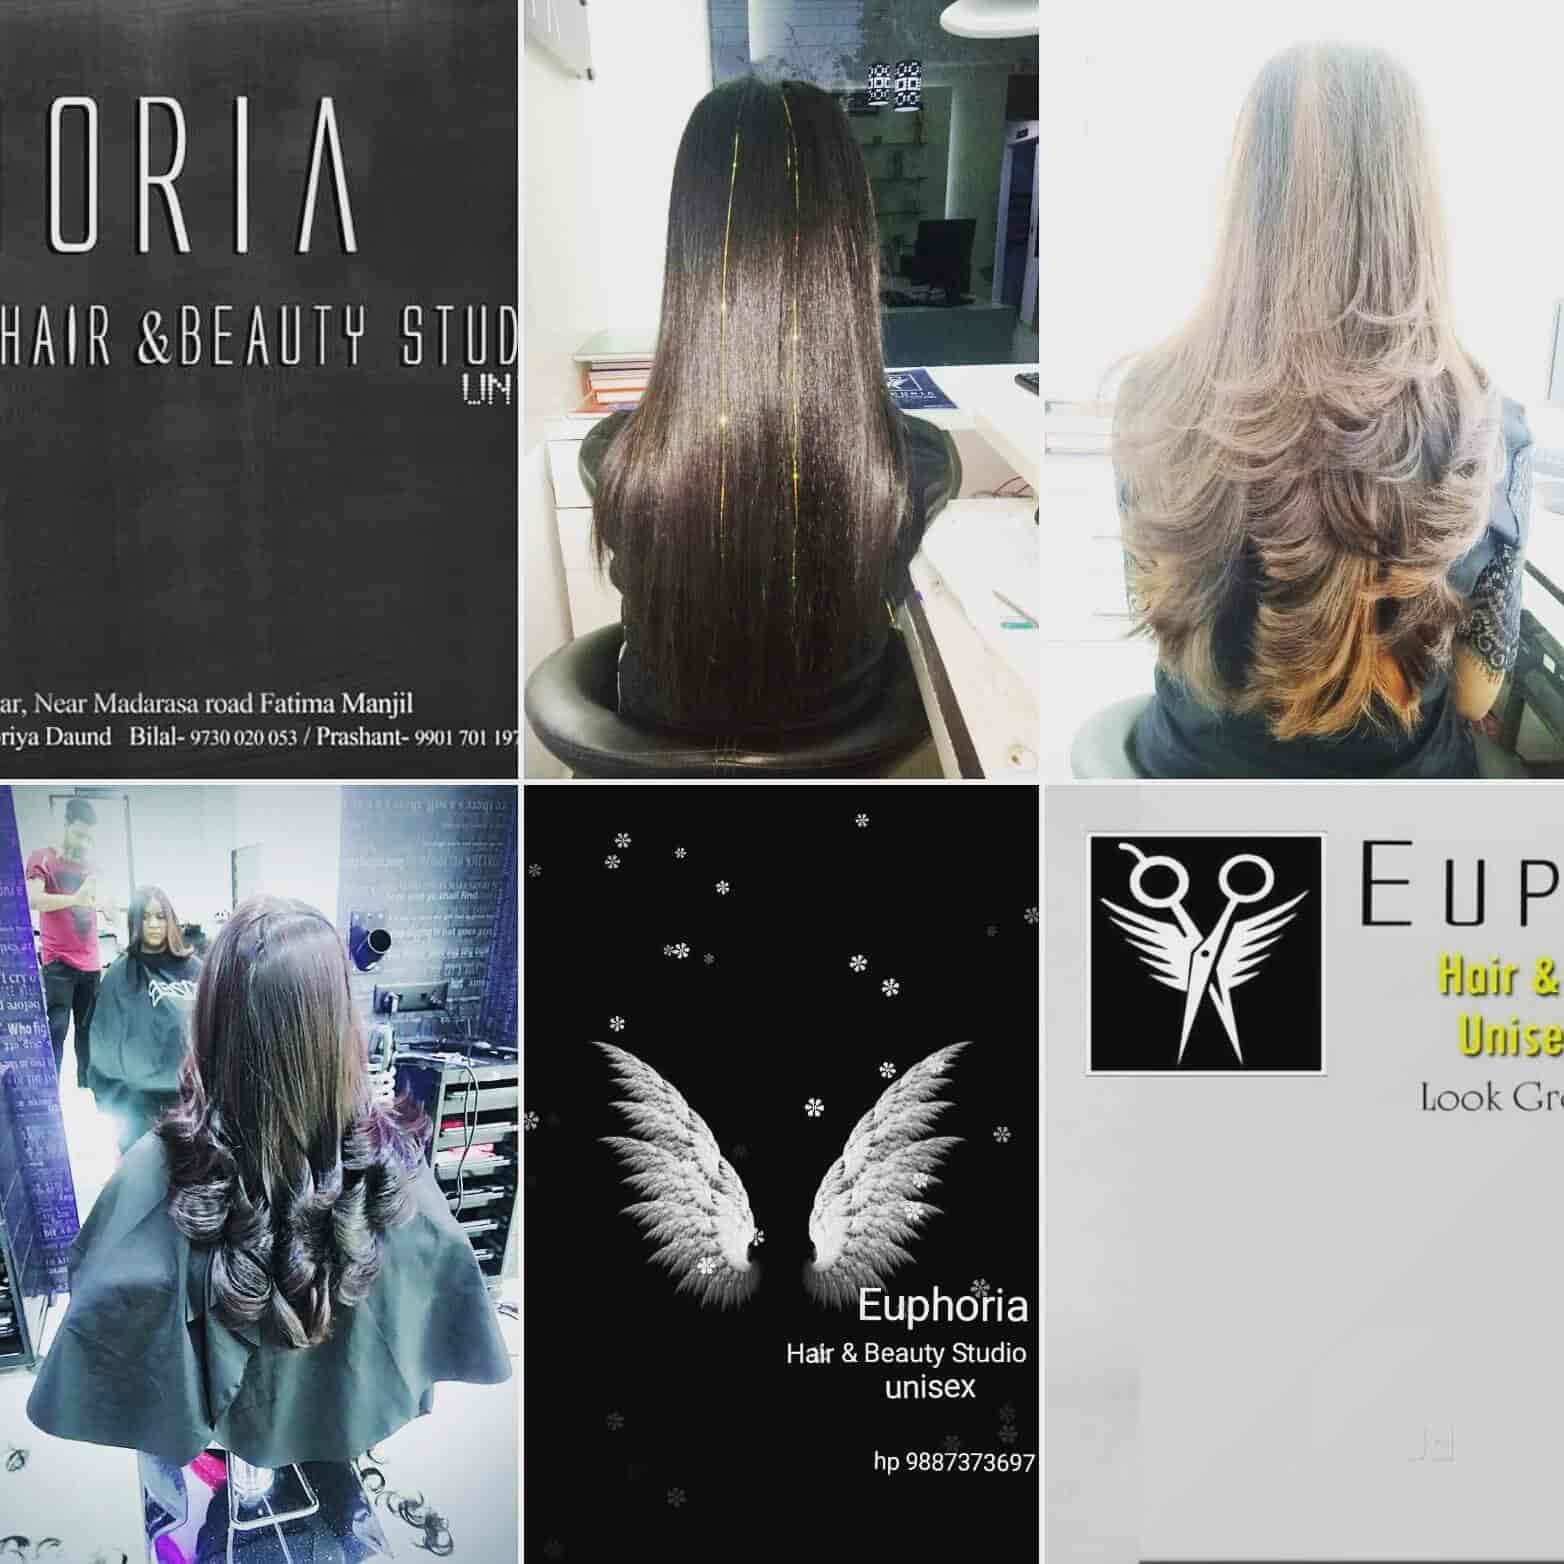 Euphoria Hair Beauty Studio Unisex Academy Beauty Spas In Daund